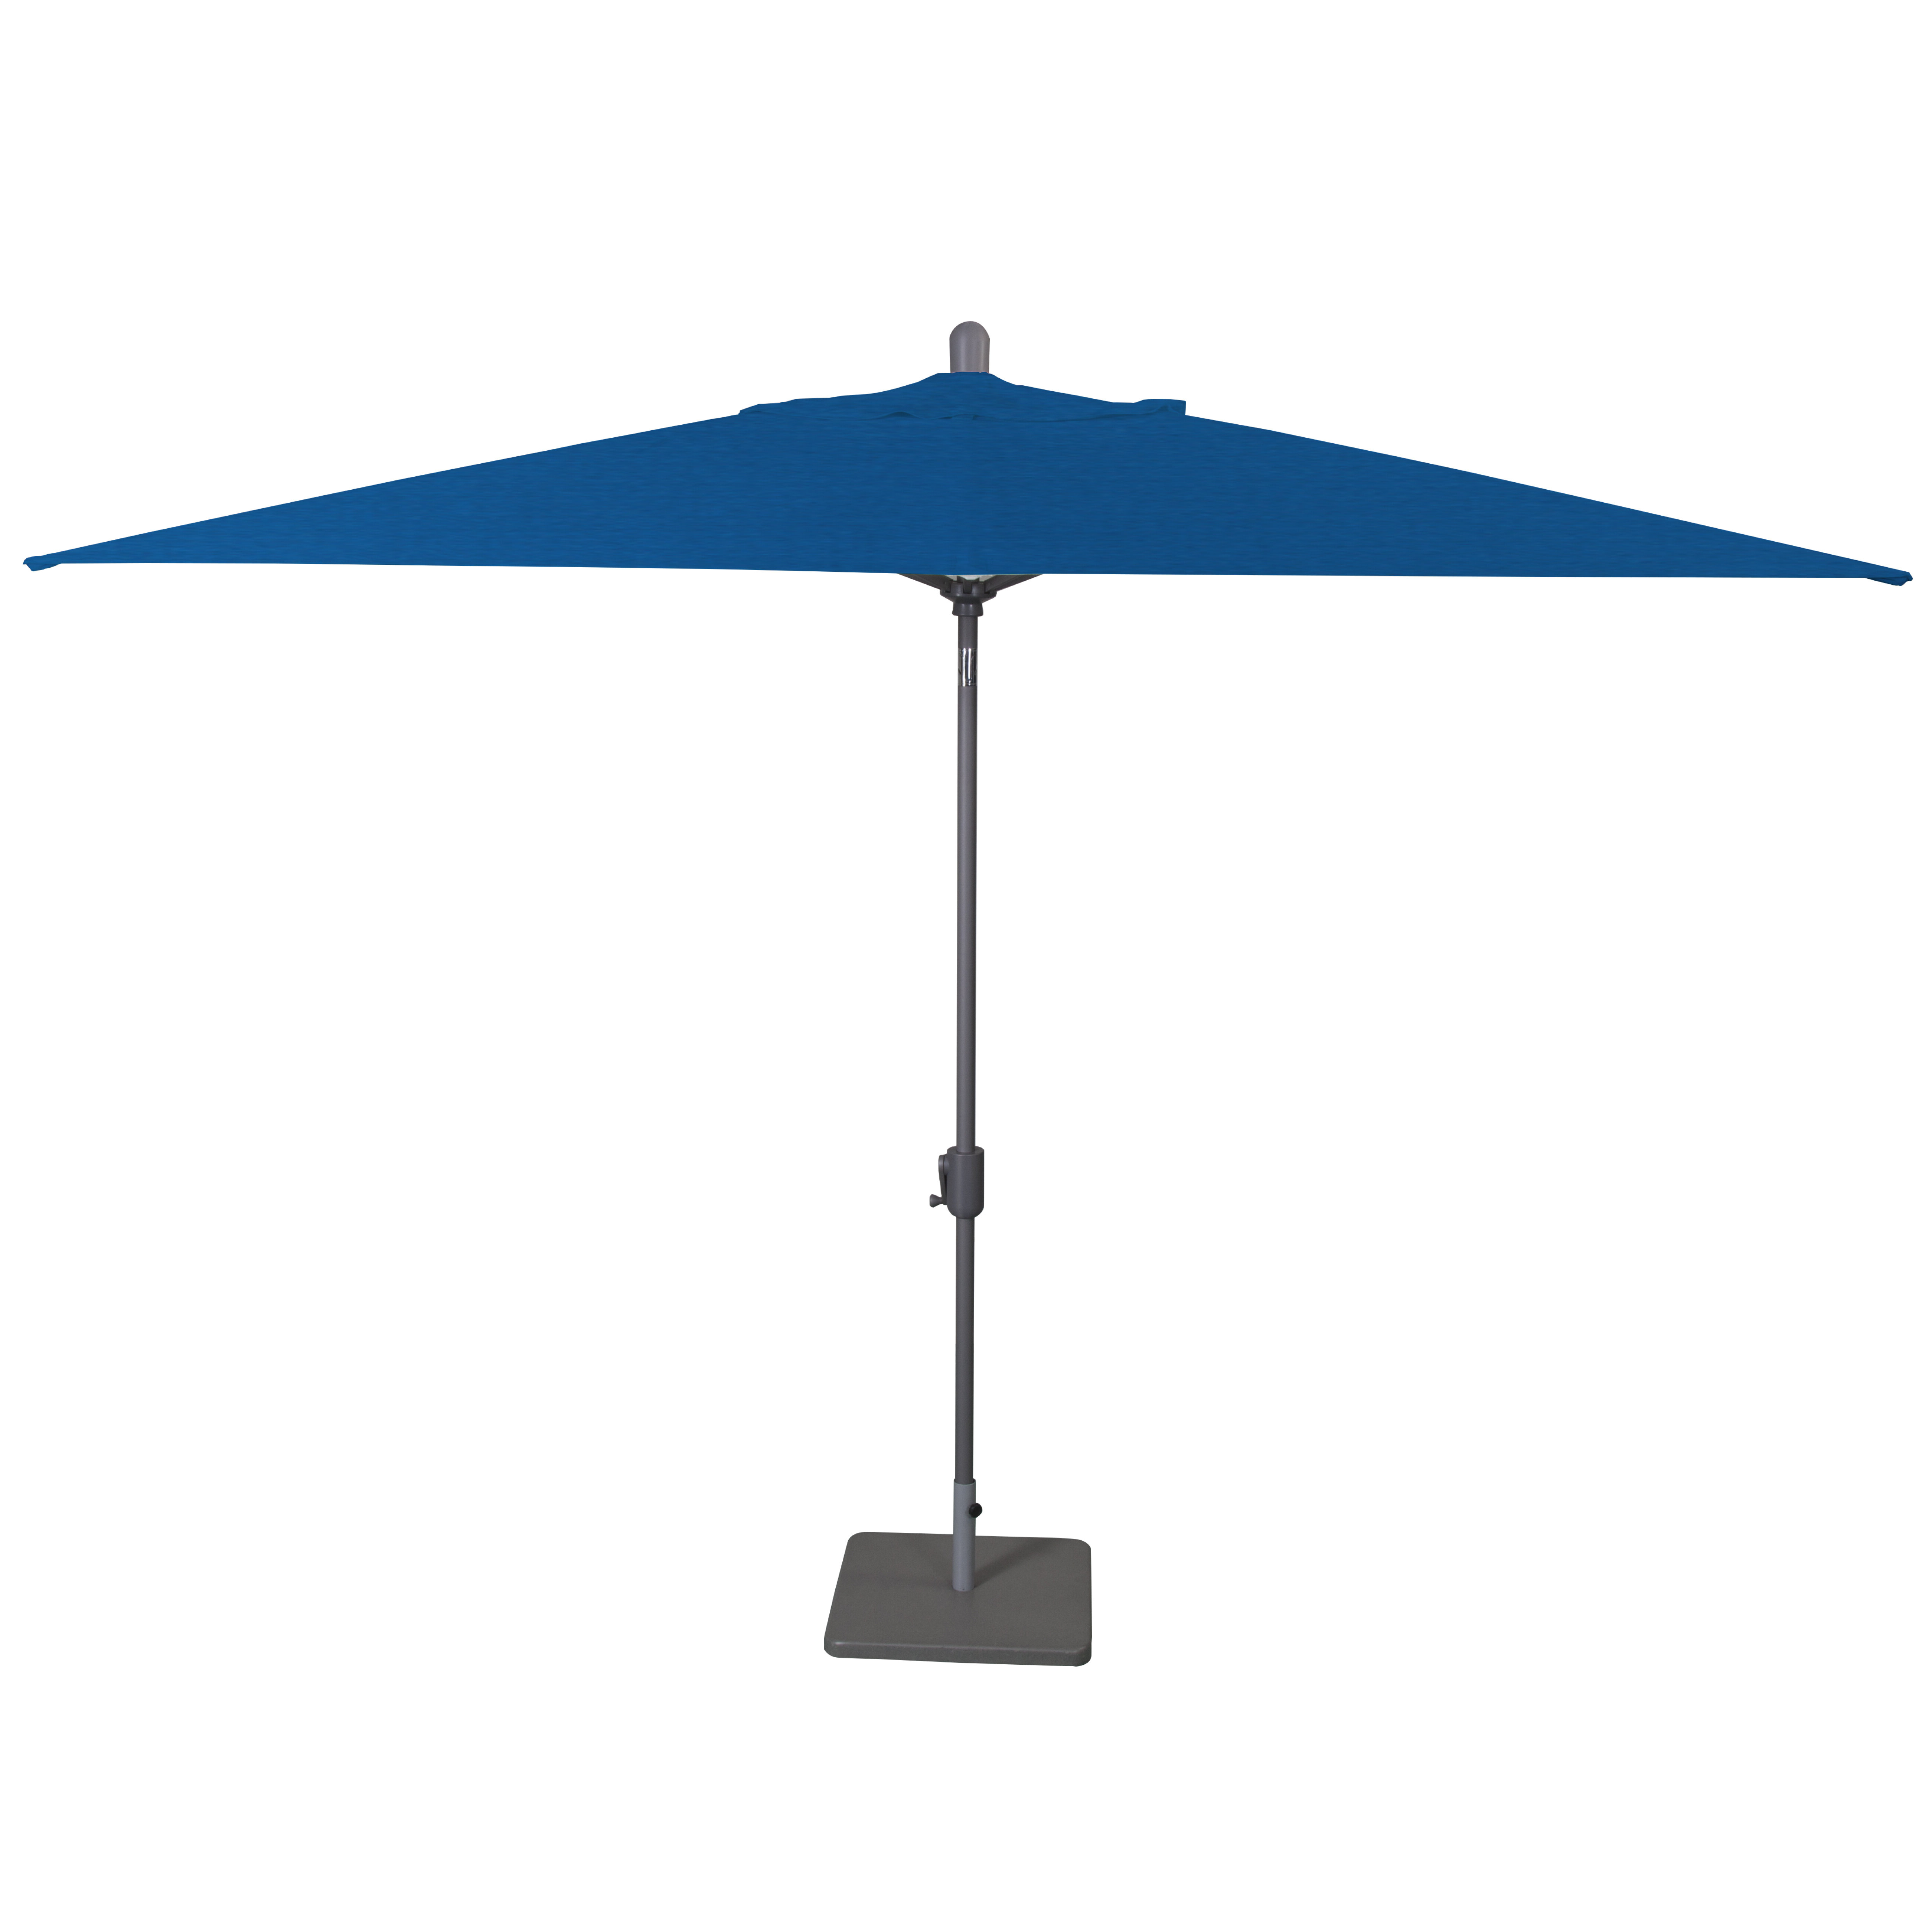 Recent Wieczorek Auto Tilt 10' X 6.5' Rectangular Market Sunbrella Umbrella Regarding Madalyn Rectangular Market Sunbrella Umbrellas (Gallery 1 of 20)